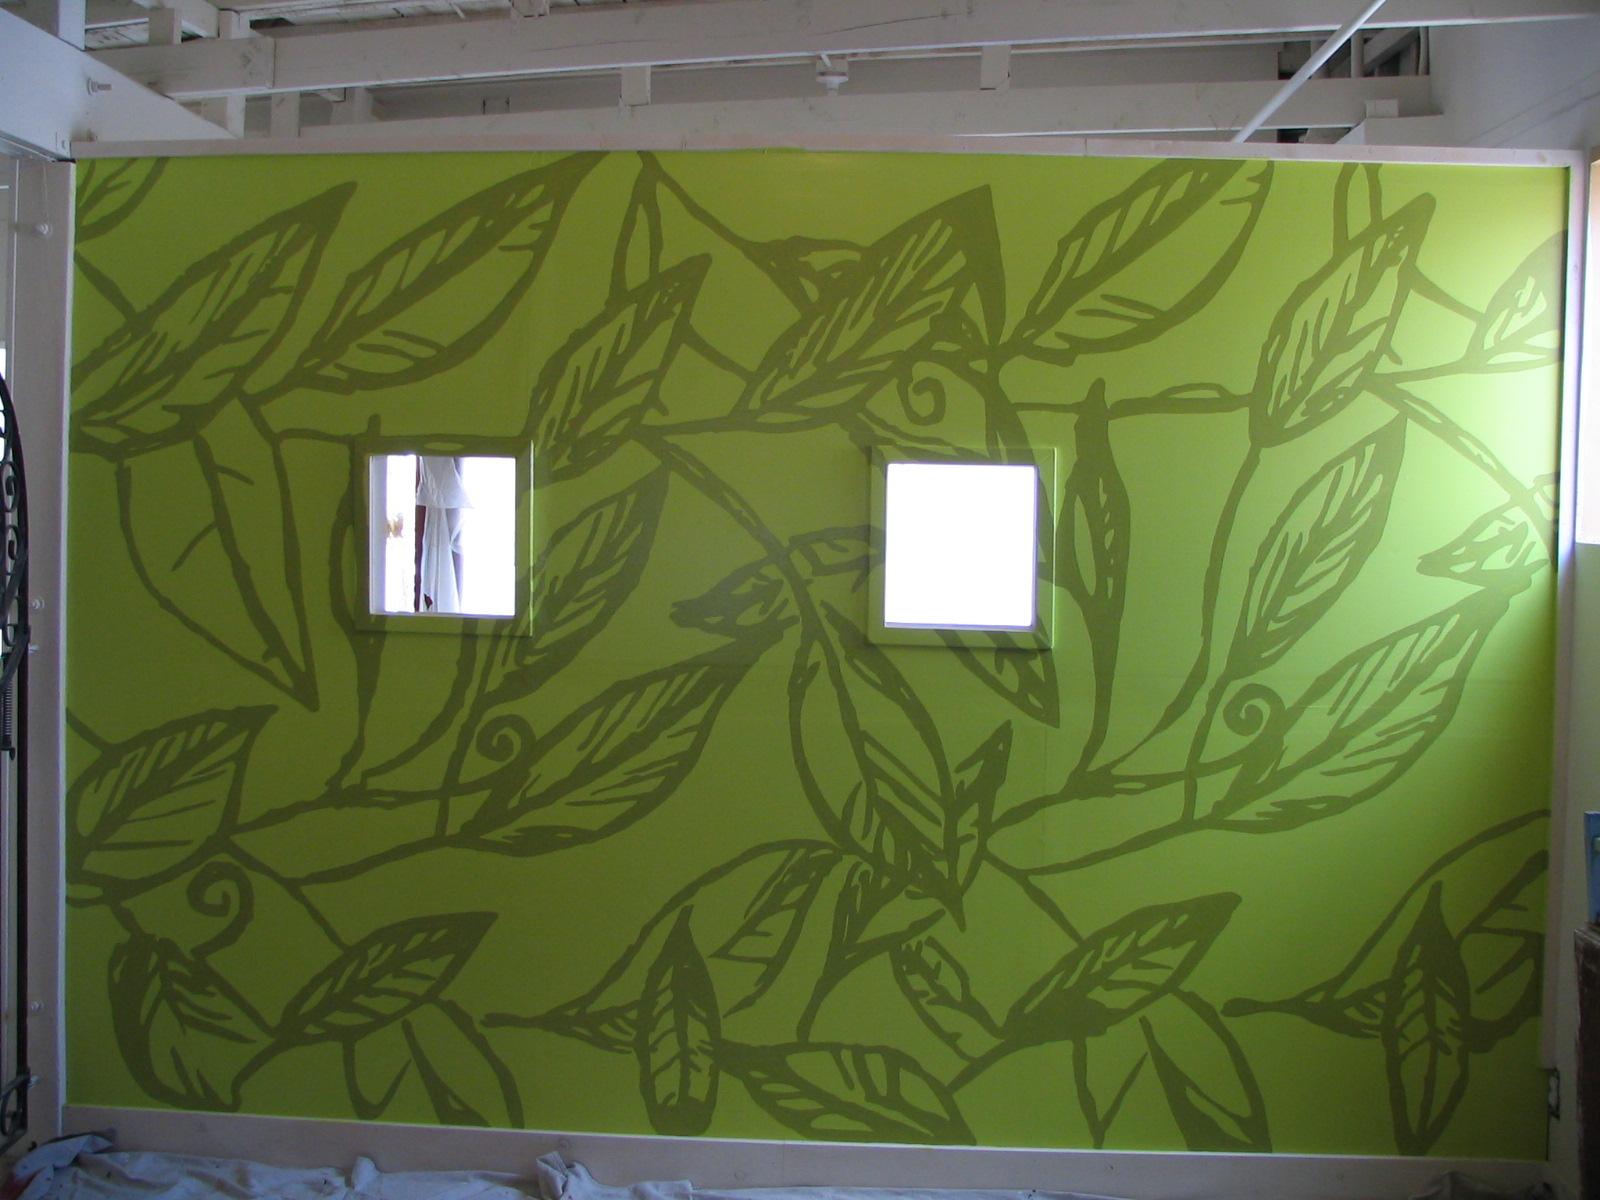 Handpainted Wall Graphic.